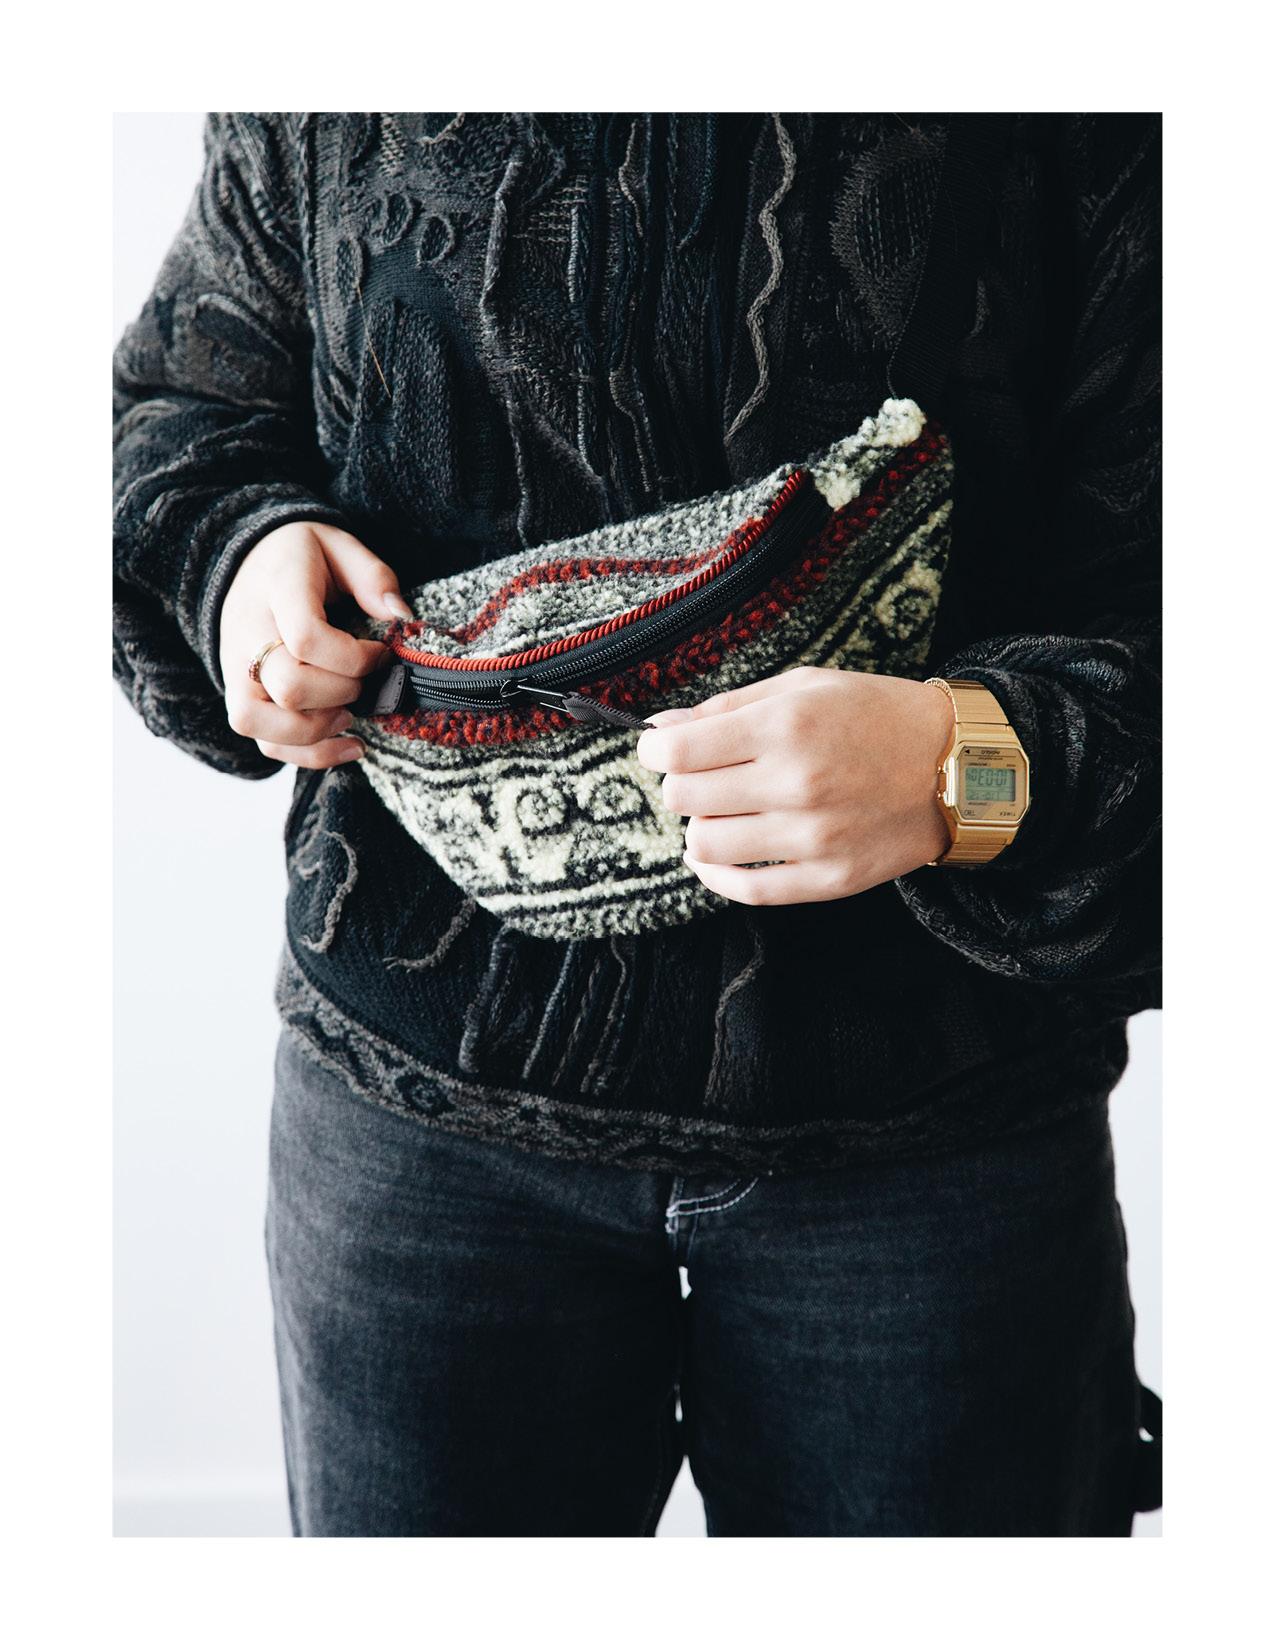 kapital birds-eye fanny pack, timex t80 watch and kapital boro crew sweater on body